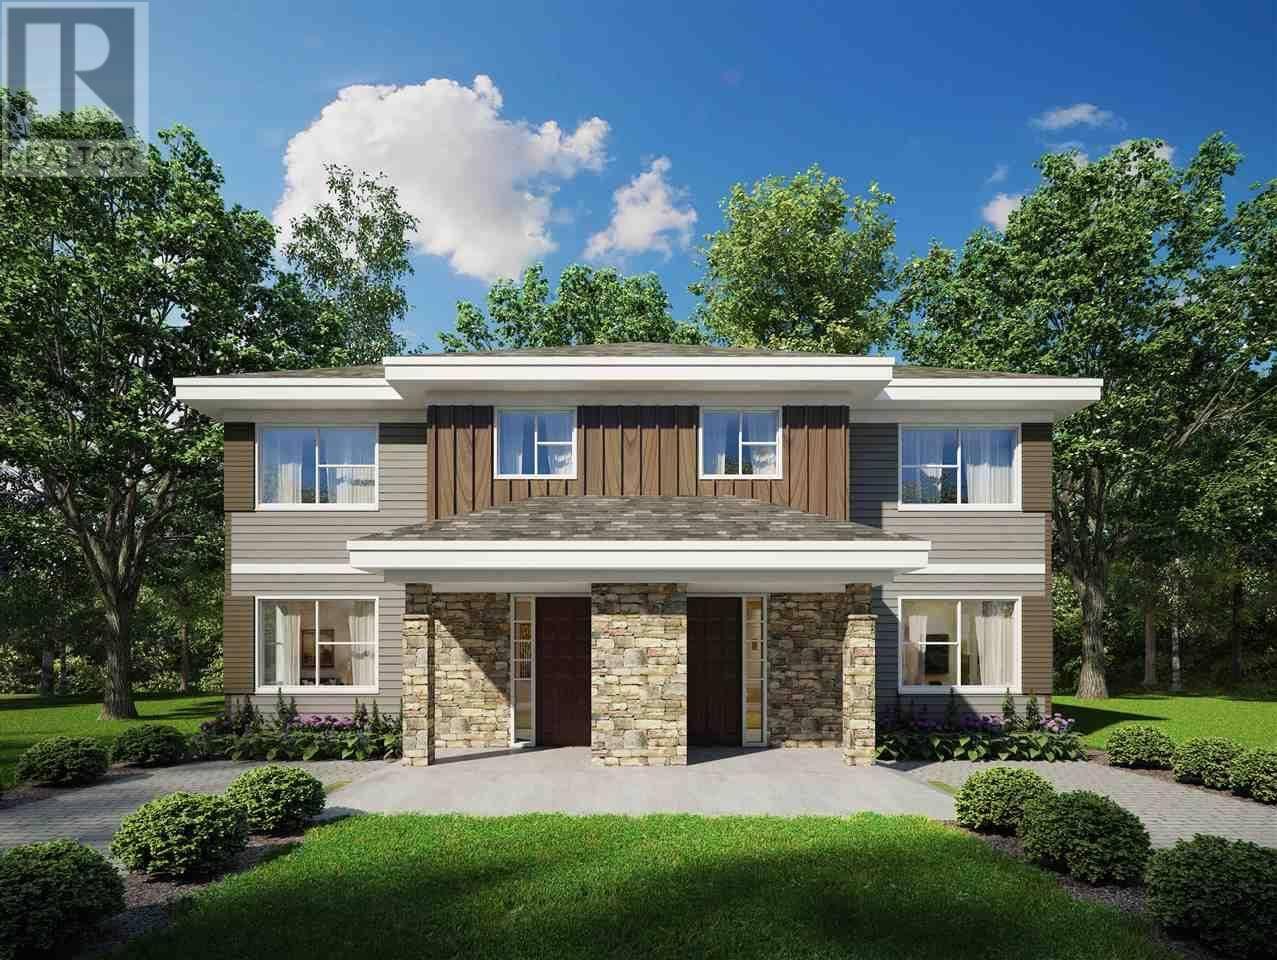 House for sale at 762 Herring Cove Rd Unit B Herring Cove Nova Scotia - MLS: 201919223